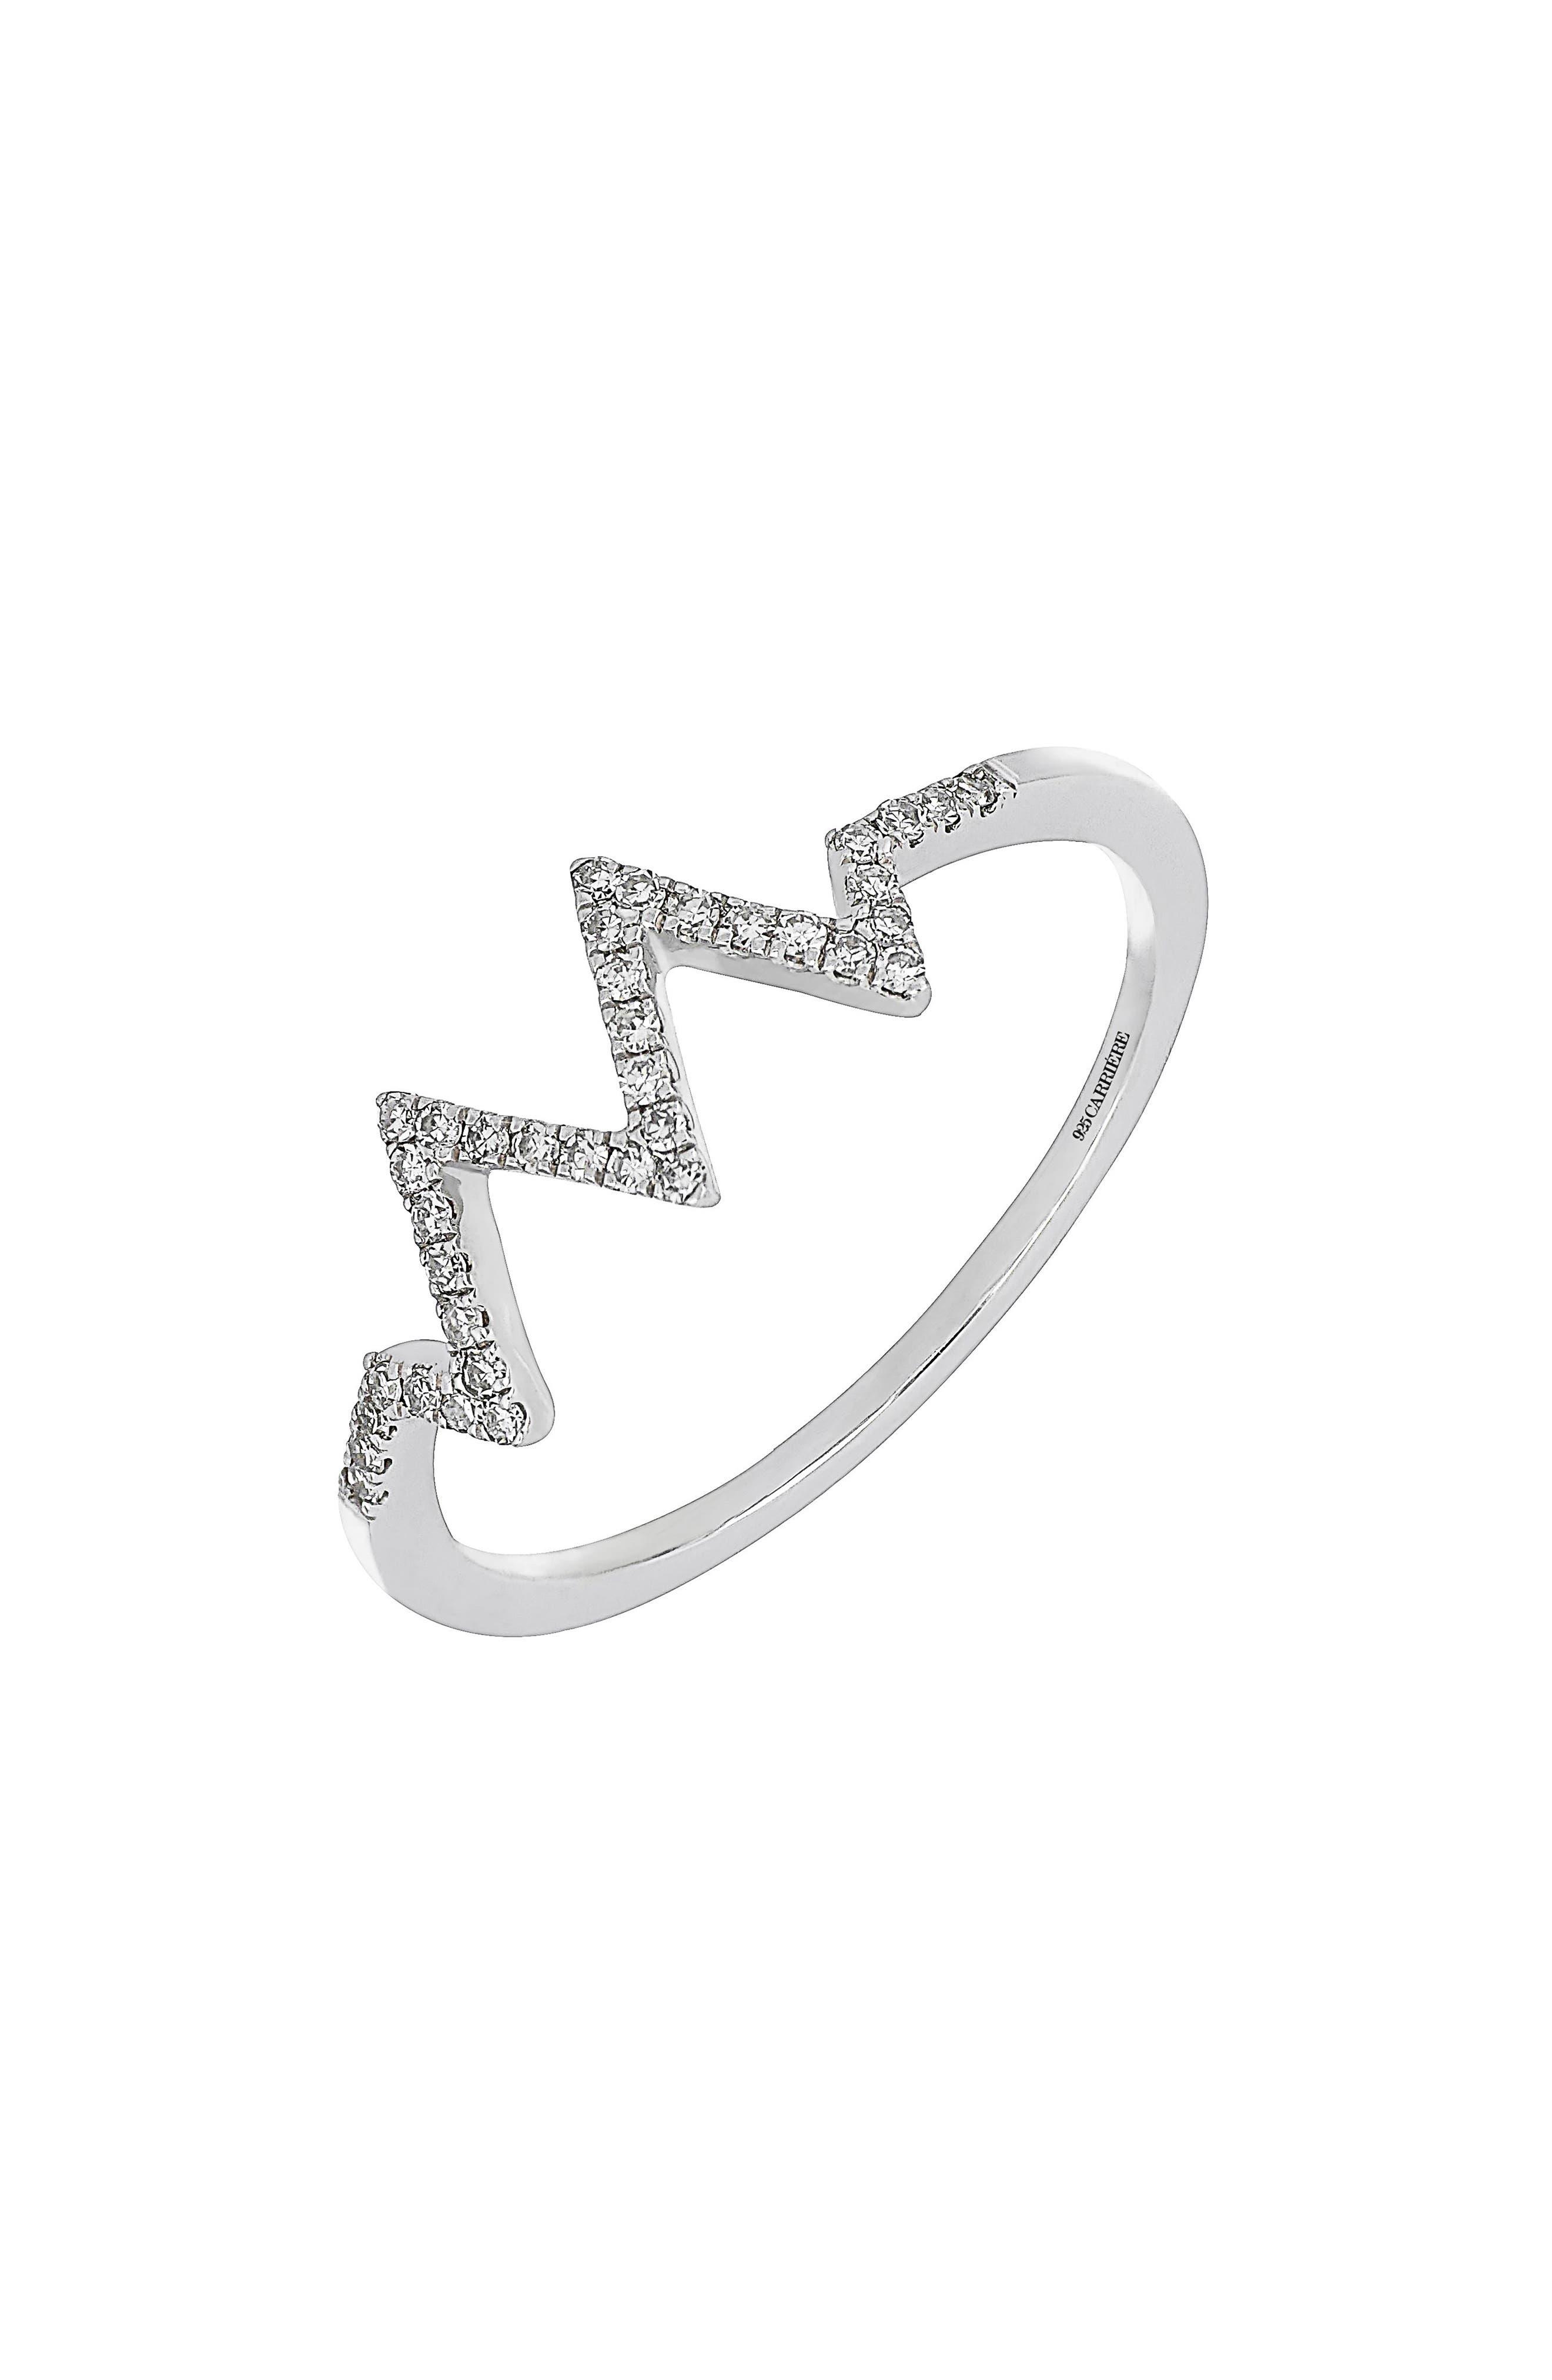 Carrière Zigzag Diamond Ring,                             Main thumbnail 1, color,